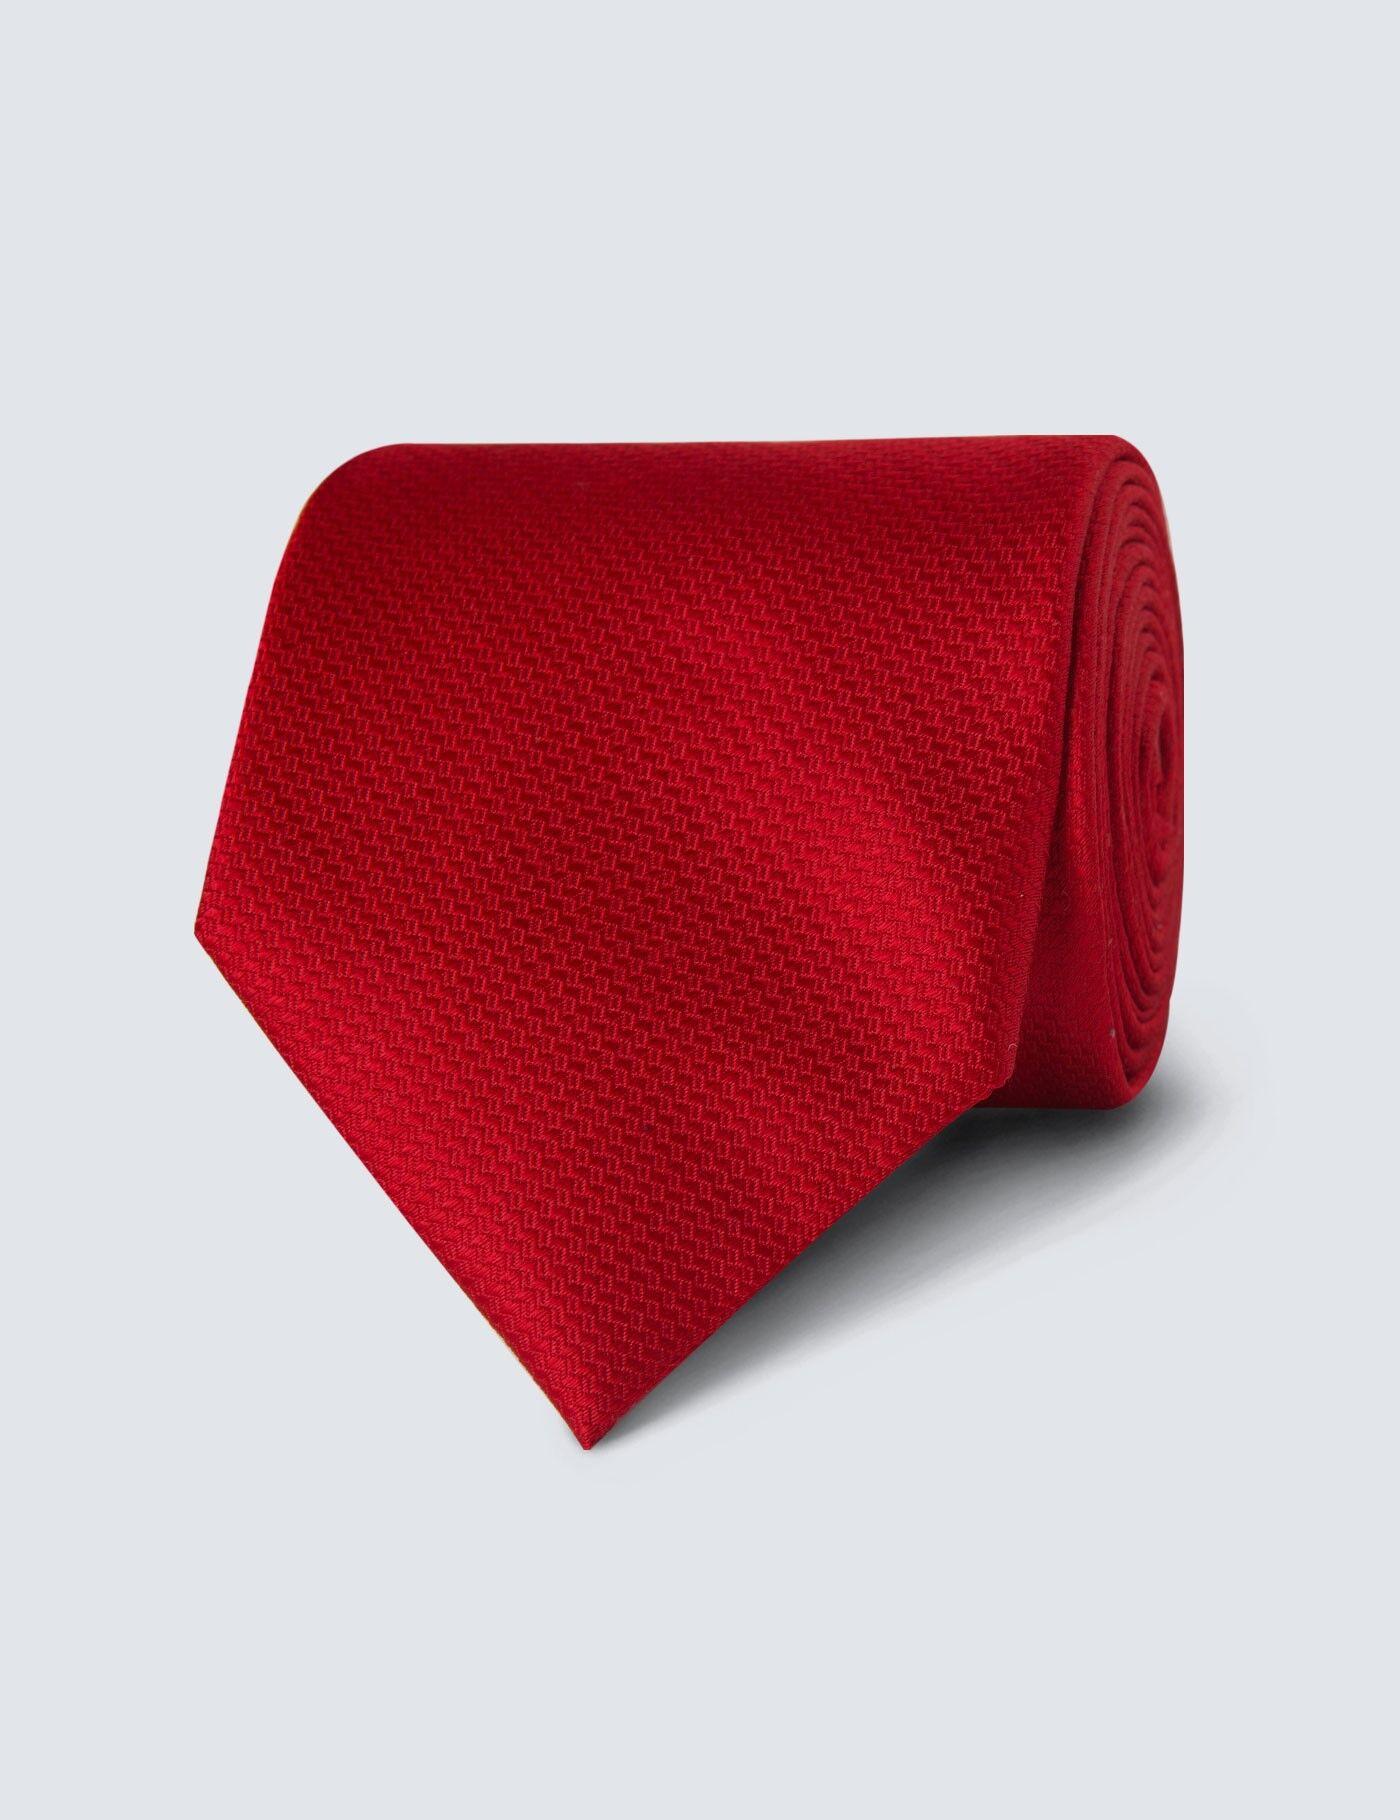 Hawes & Curtis Men's Plain Basket Weave 100% Silk Tie in Red